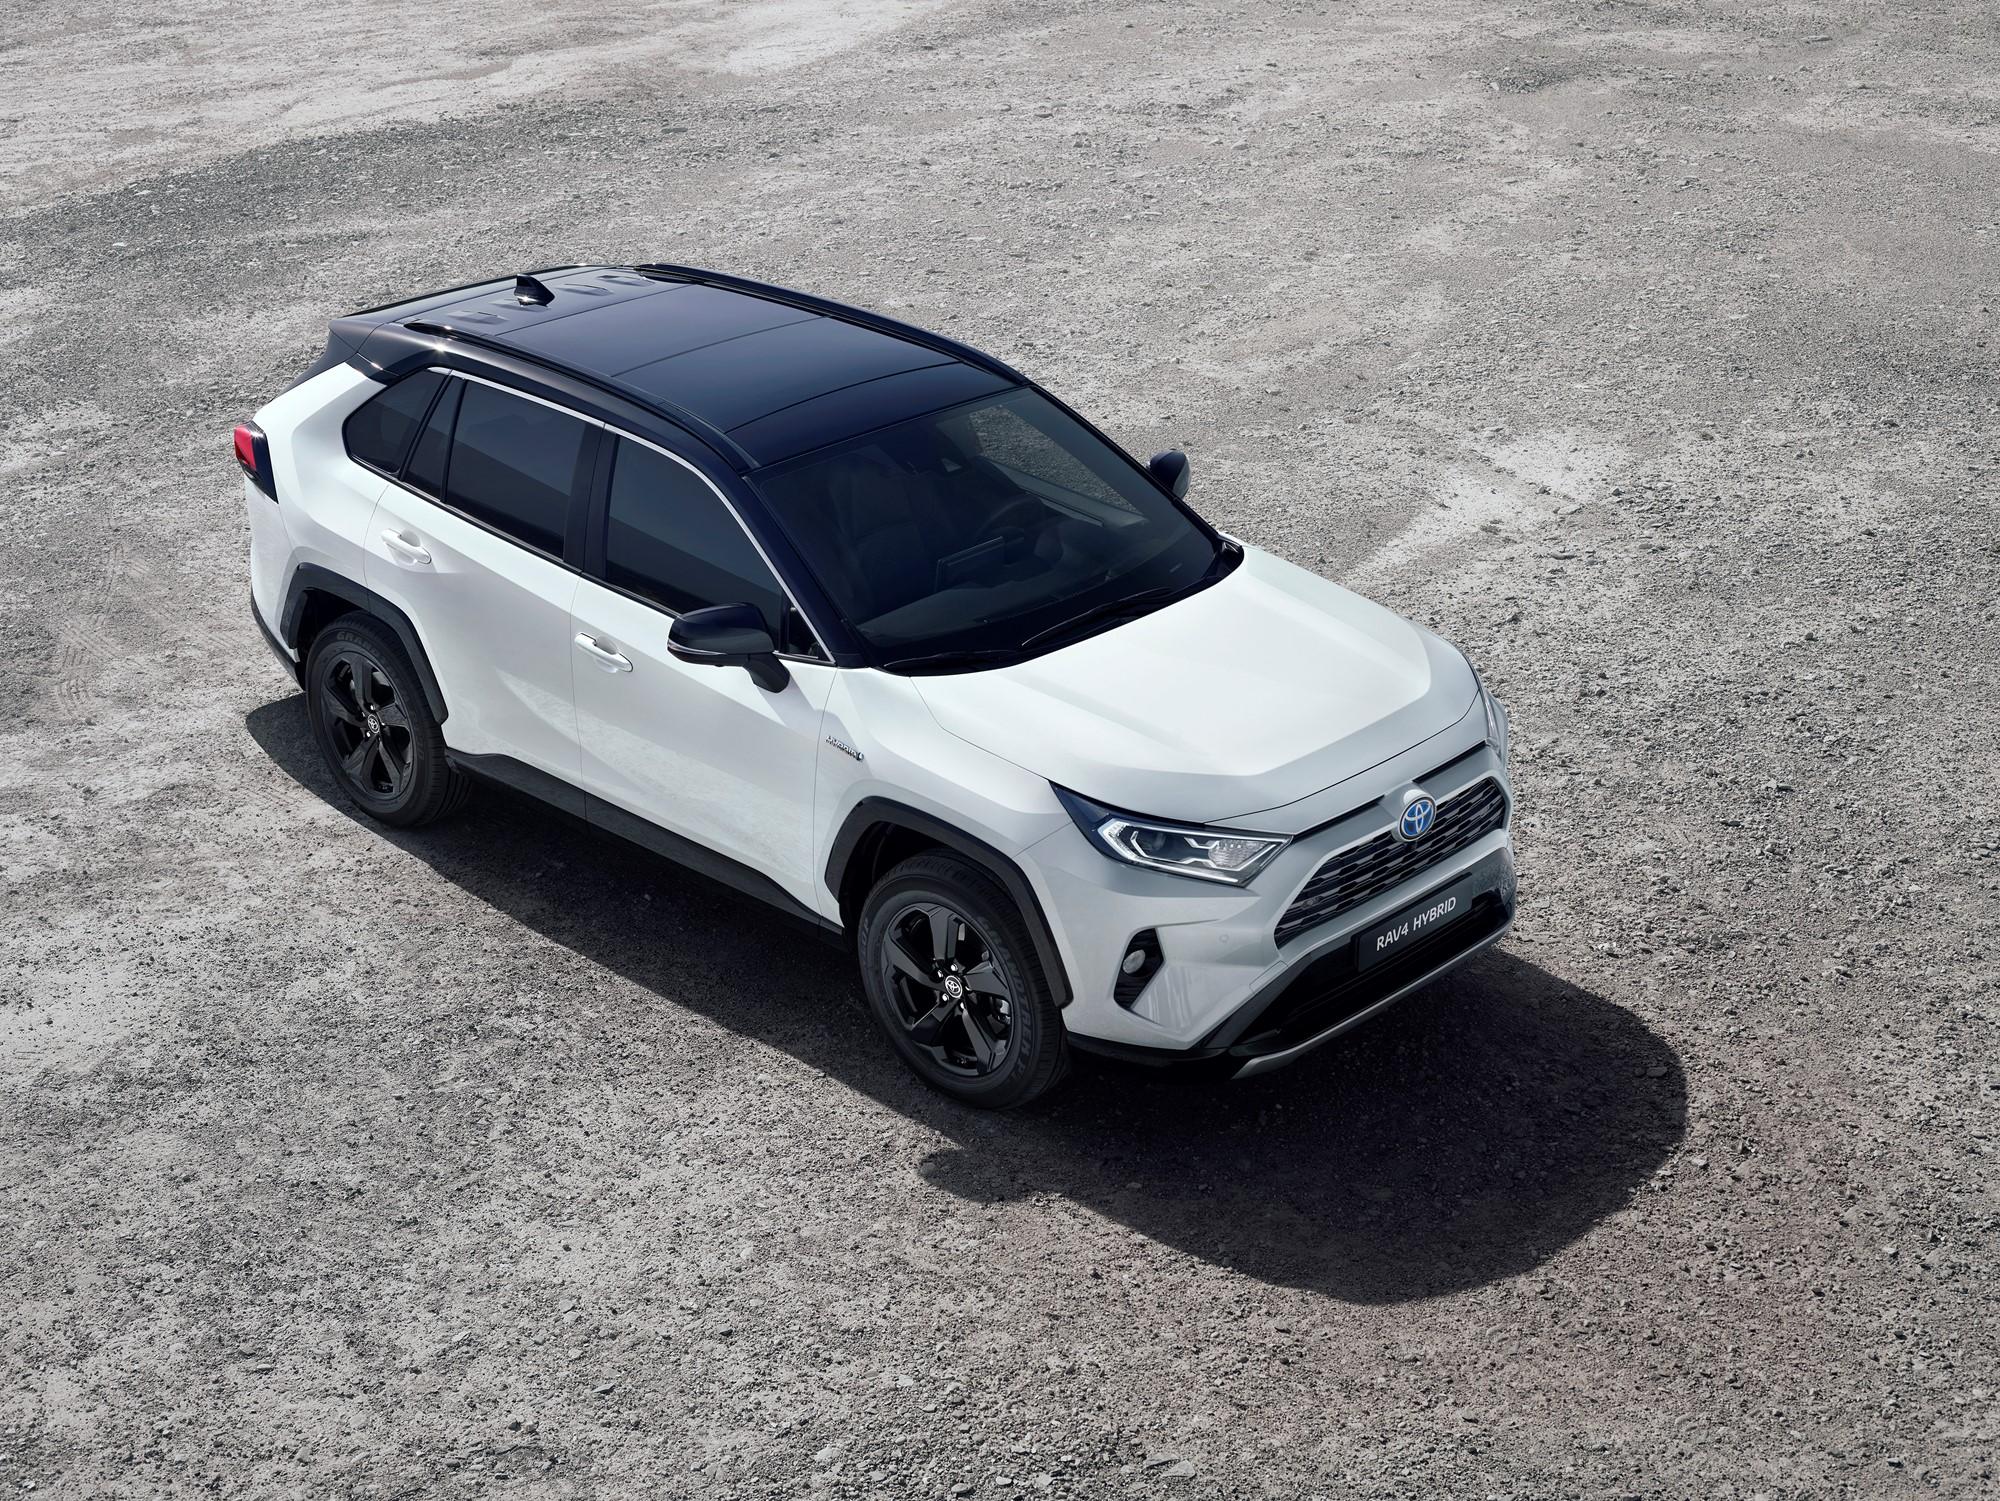 toyota reveals prices for hybrid only rav4 gallery car manufacturer news toyota reveals prices for hybrid only